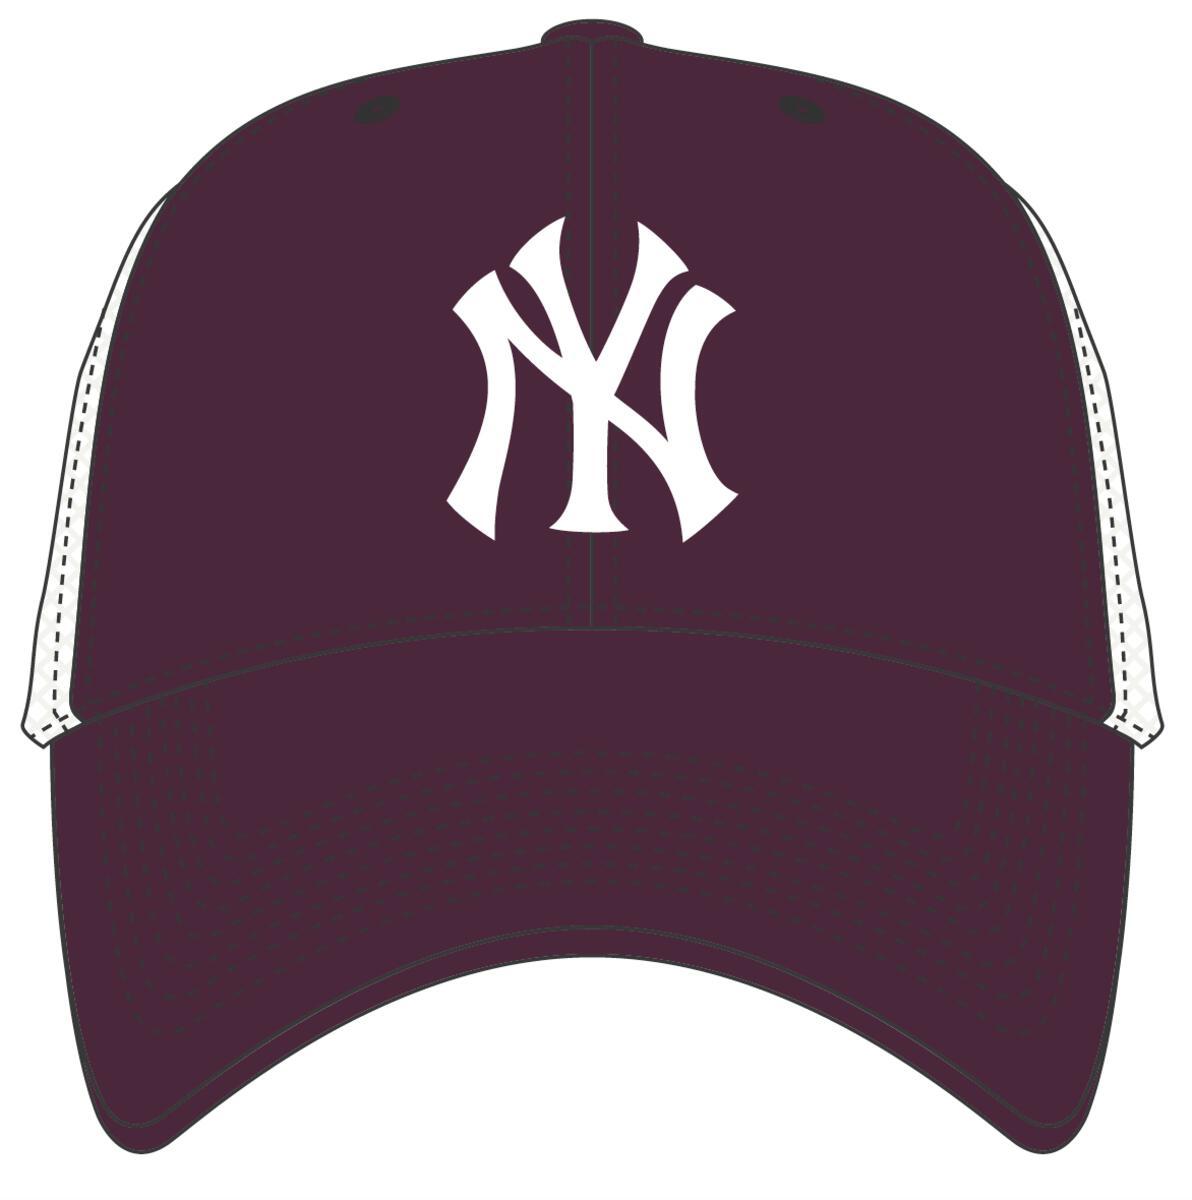 47 BRAND CZAPKA NEW YORK YANKEES BRANSON MVP BORDOWA (B-BRANS17CTP-KME)